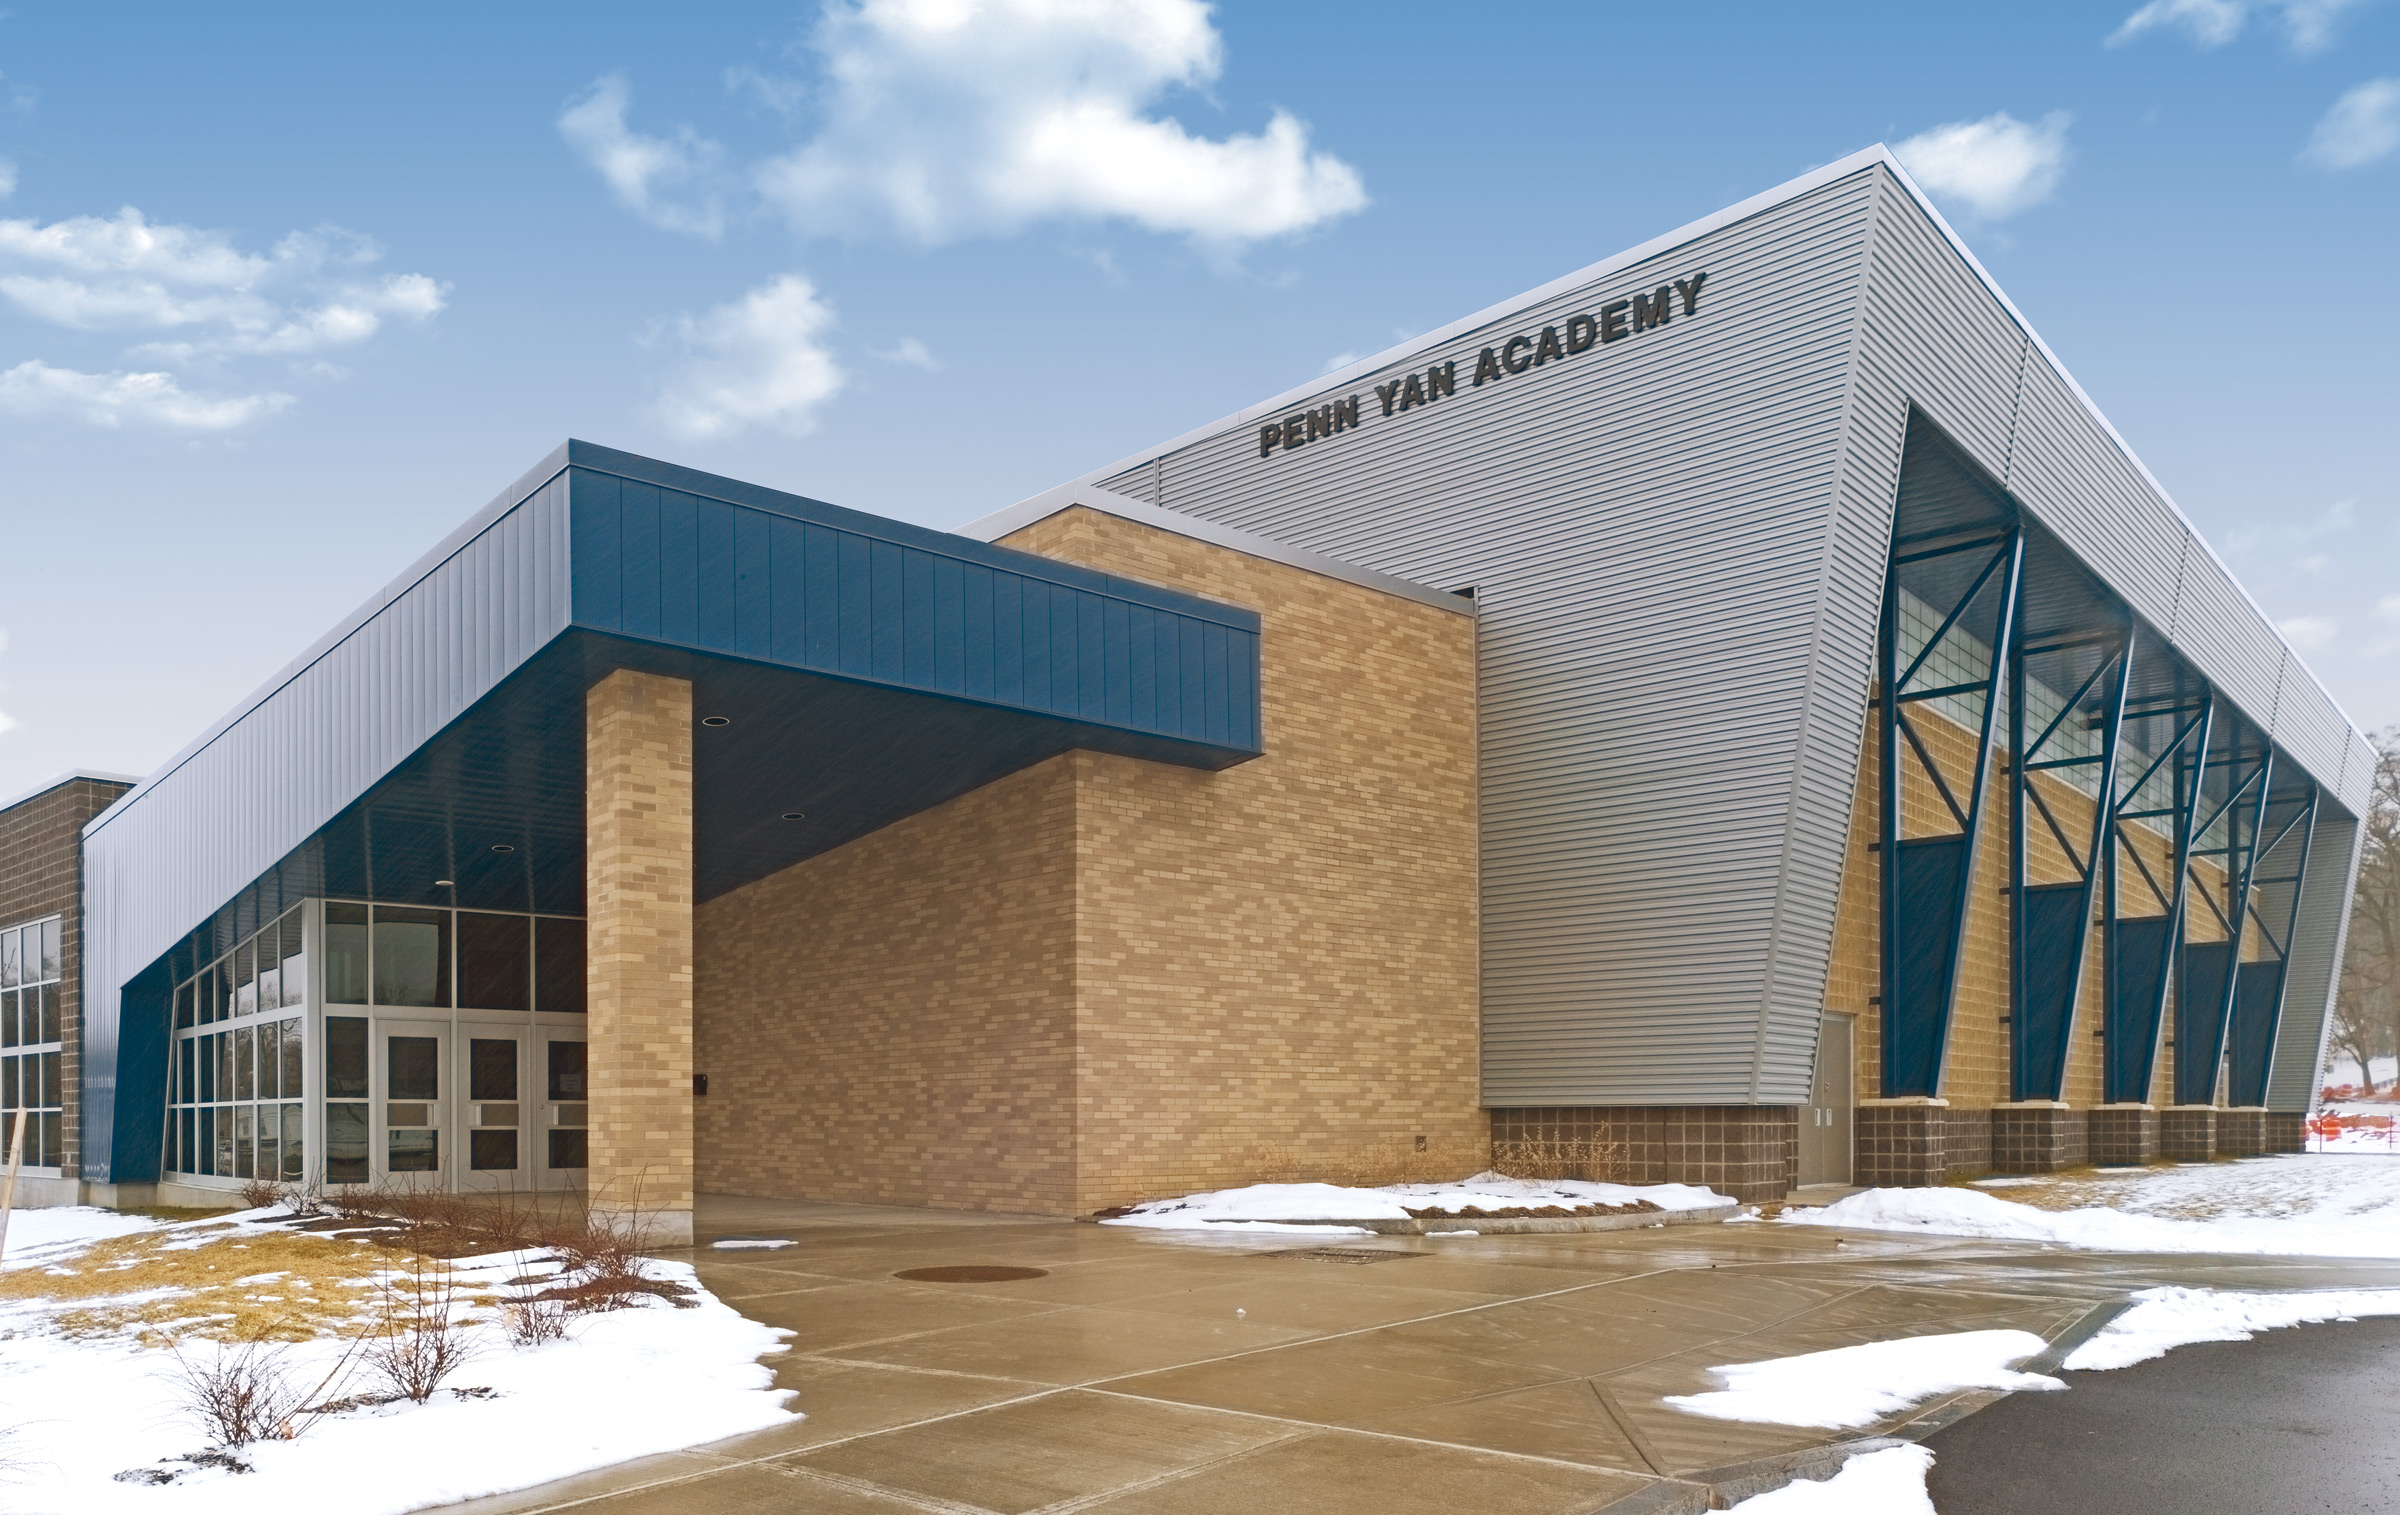 Penn Yan Academy